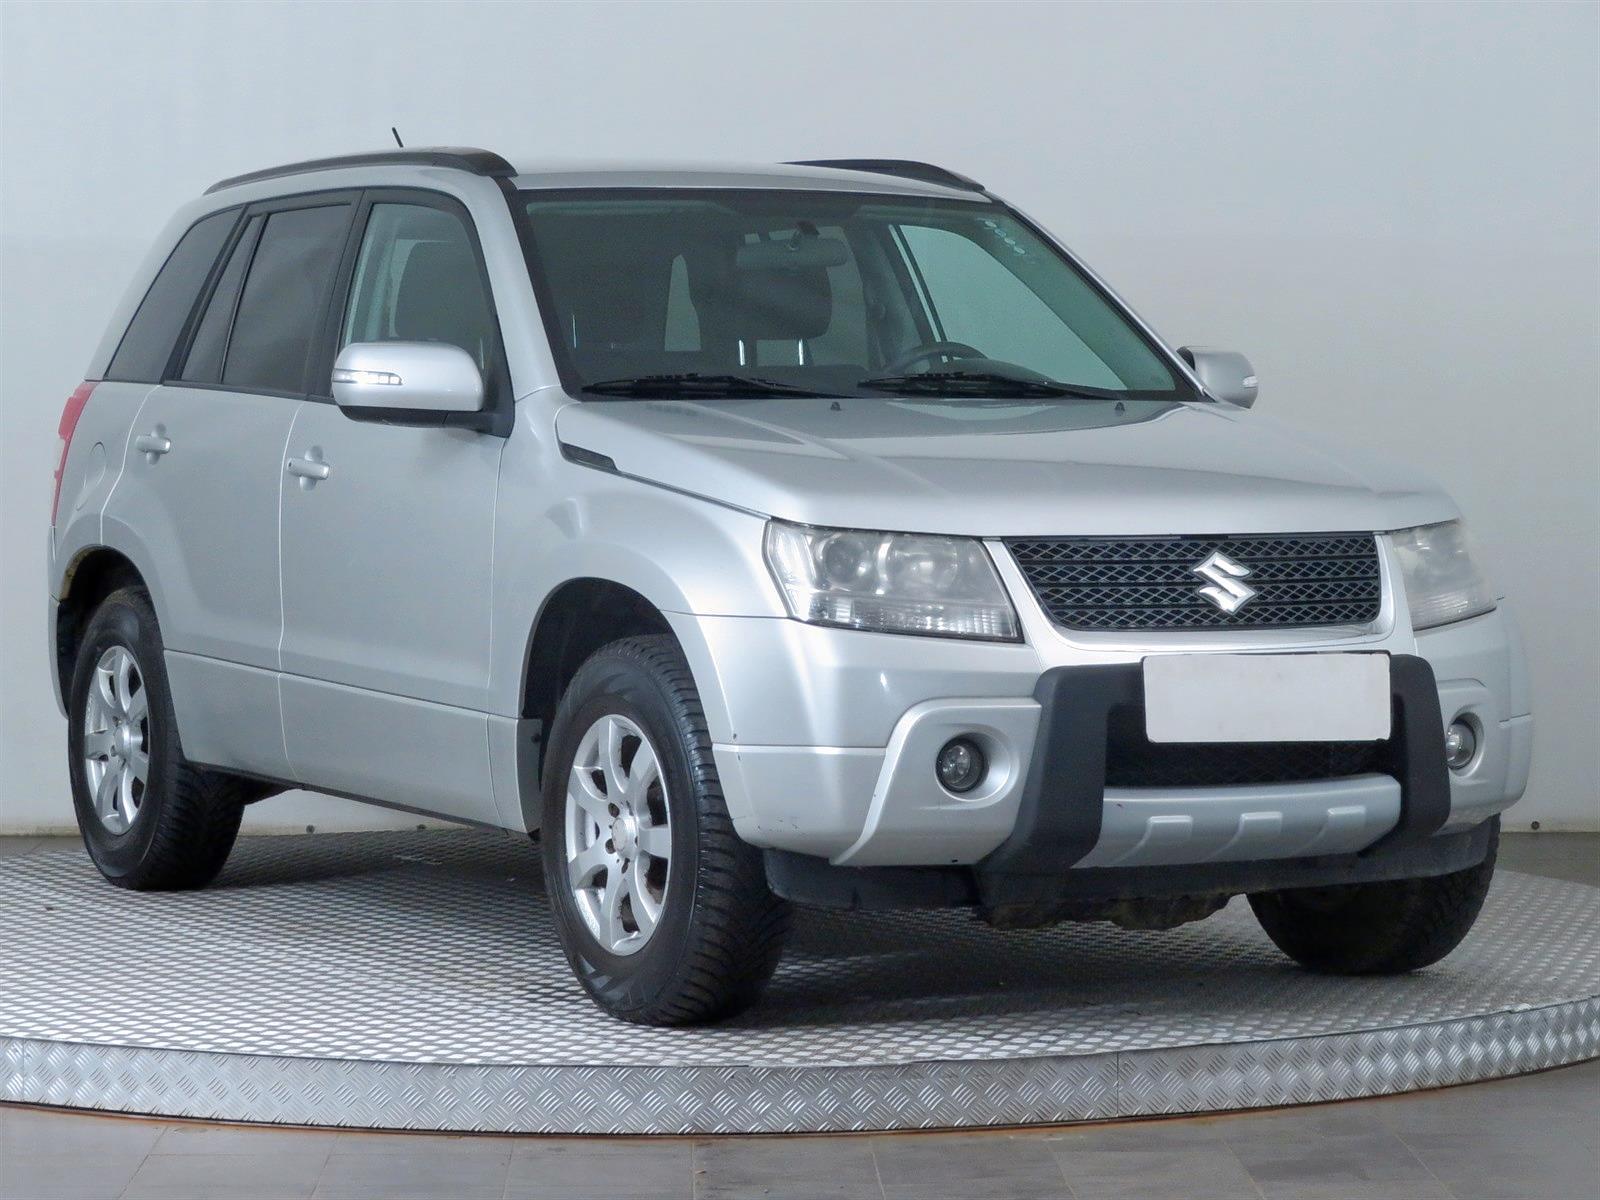 Suzuki Grand Vitara 2.4 VVT 124kW SUV benzin